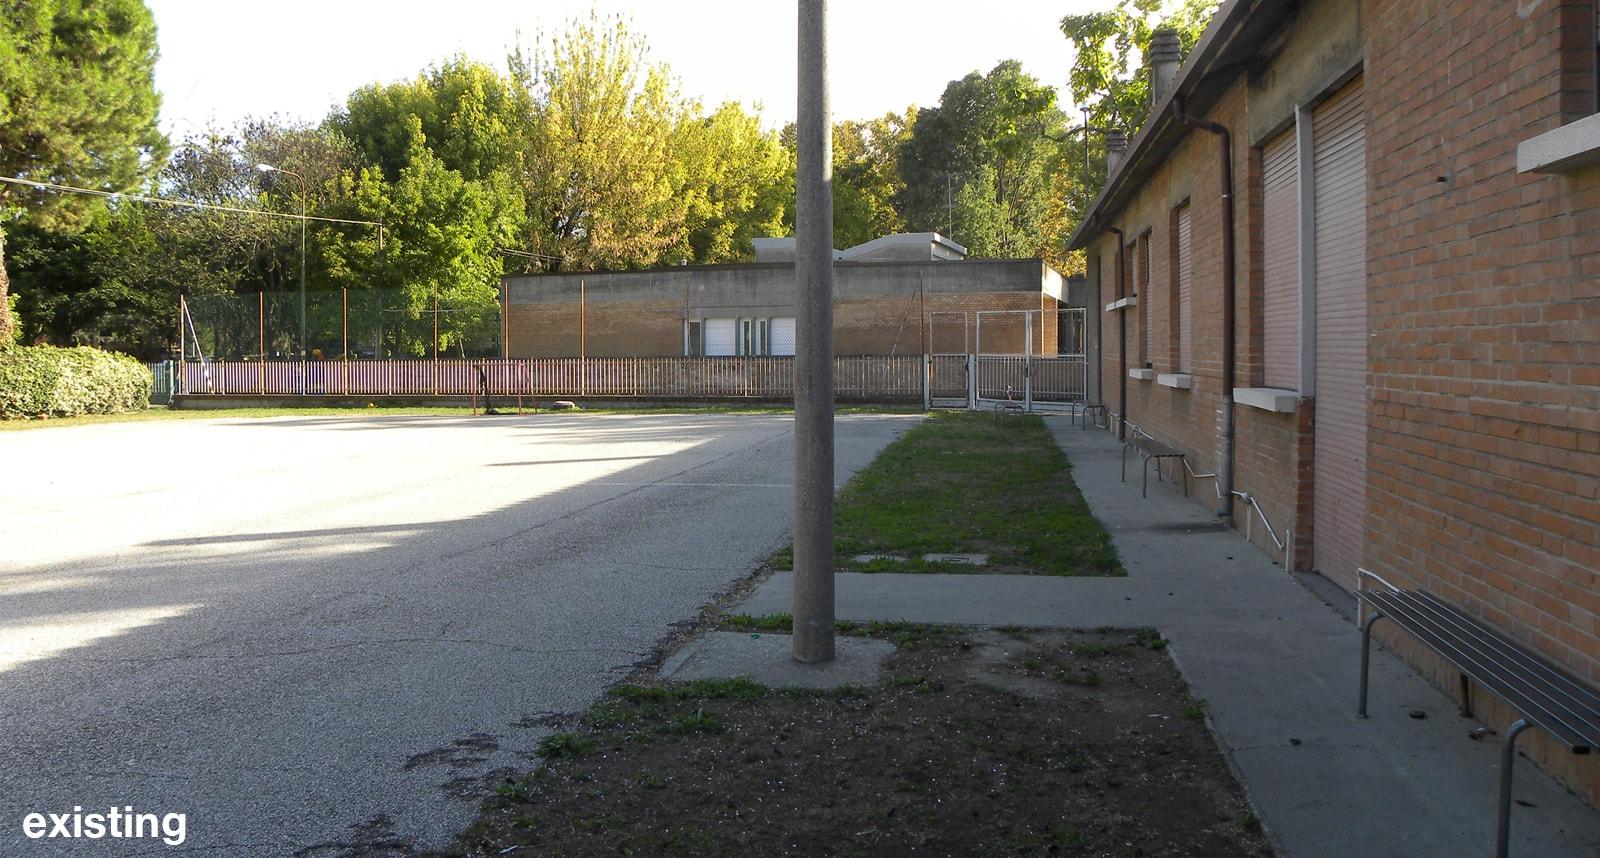 parrocchia-immacolata-existing-external-01